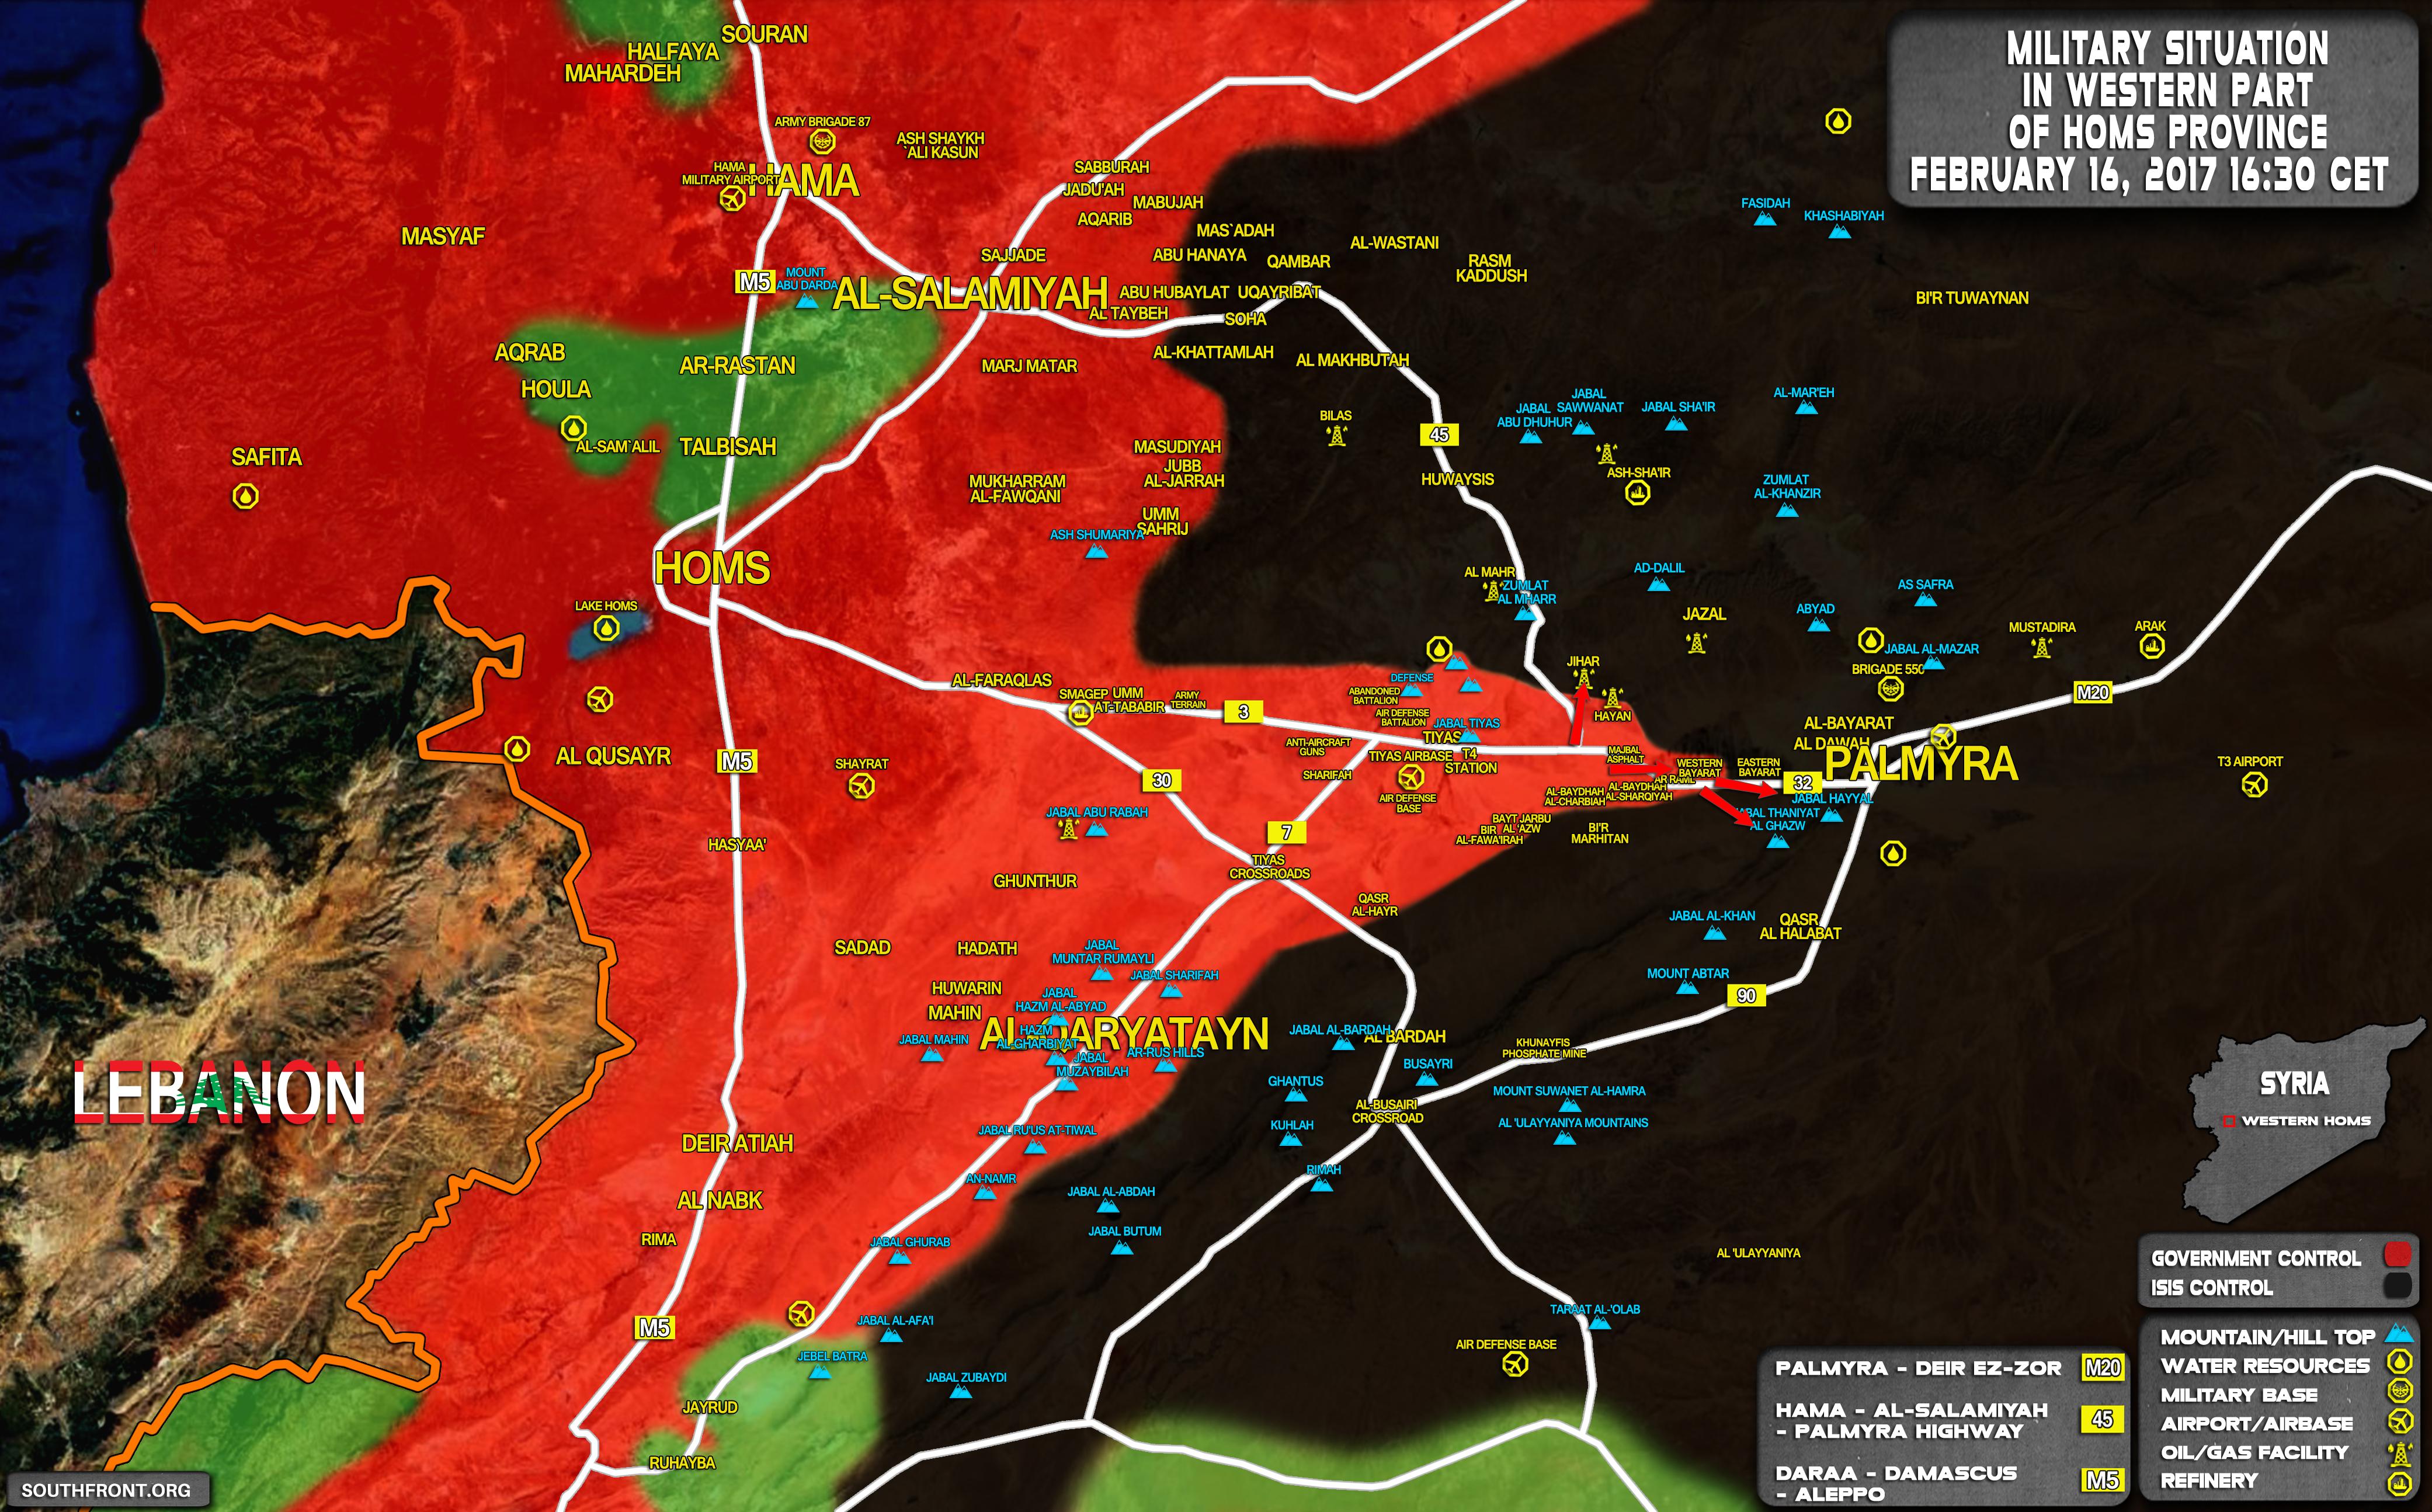 16feb16-30_Homs_Province_Syria_War_Map